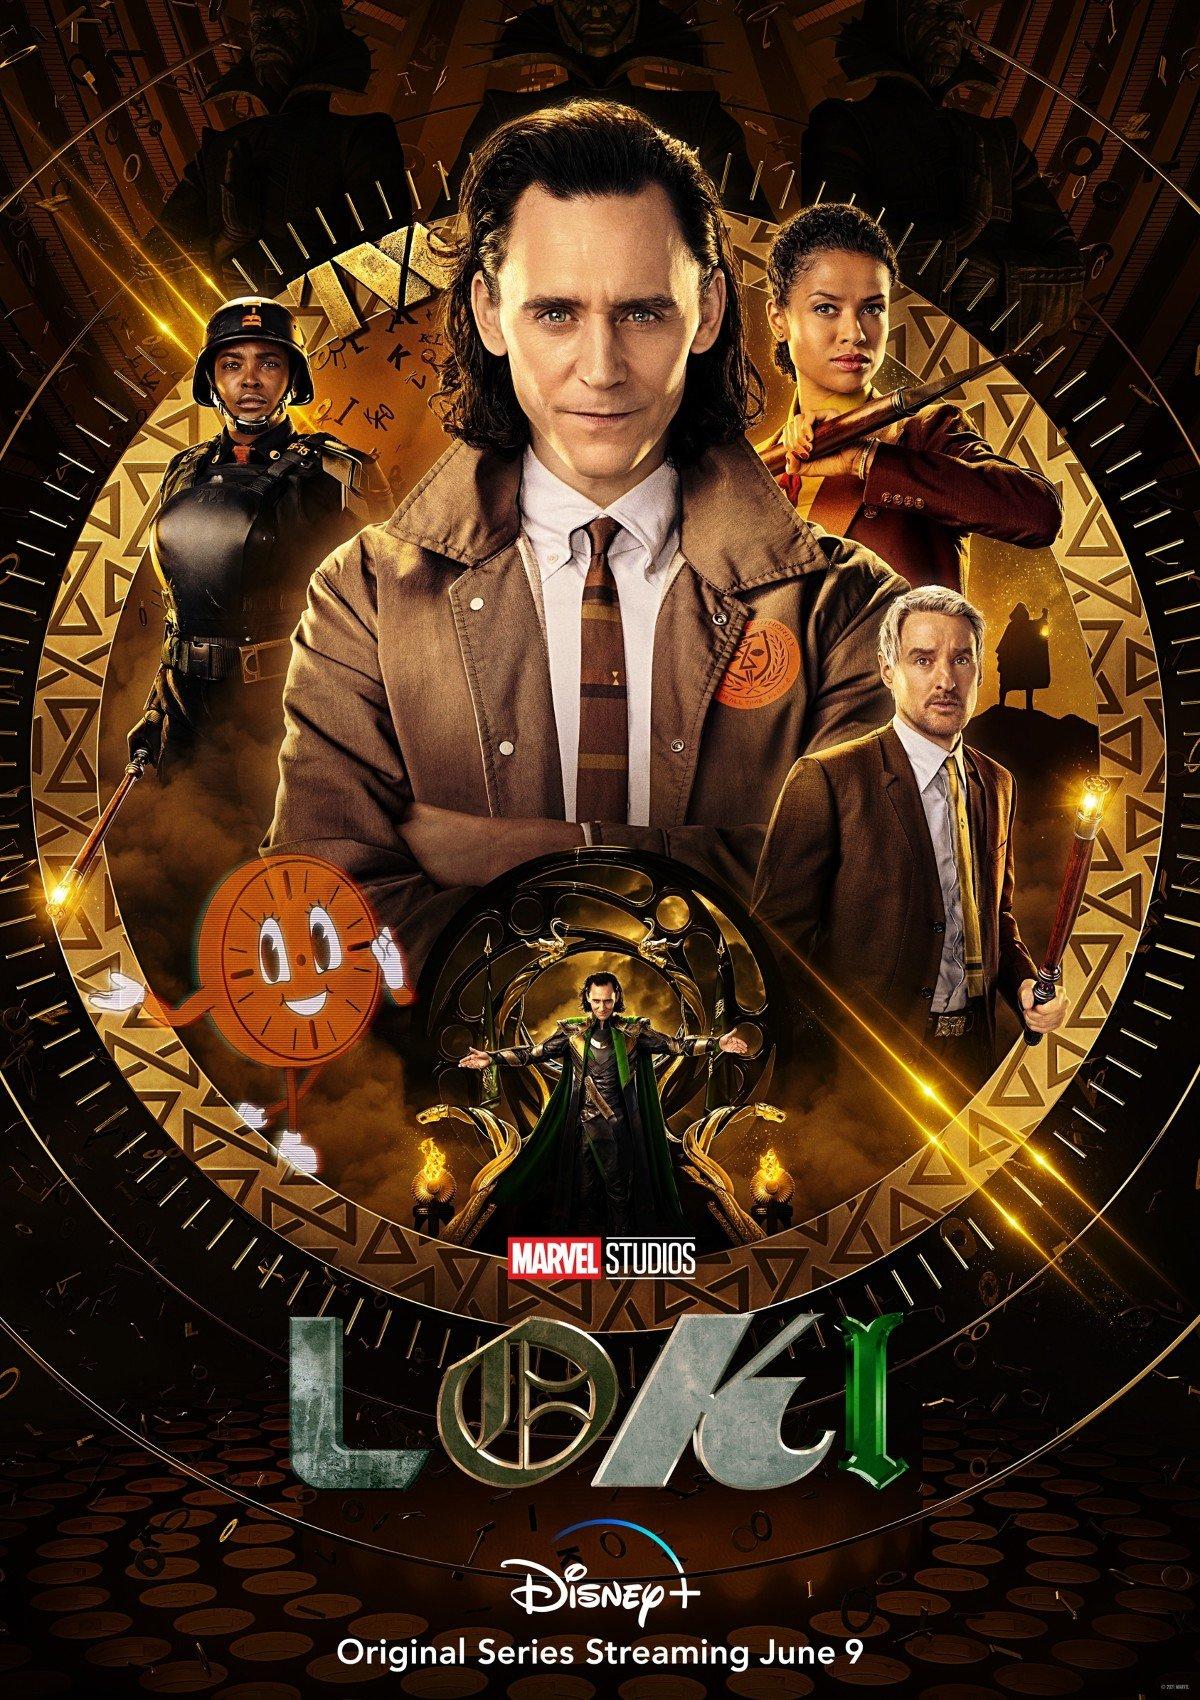 Loki Poster for Disney+ Series